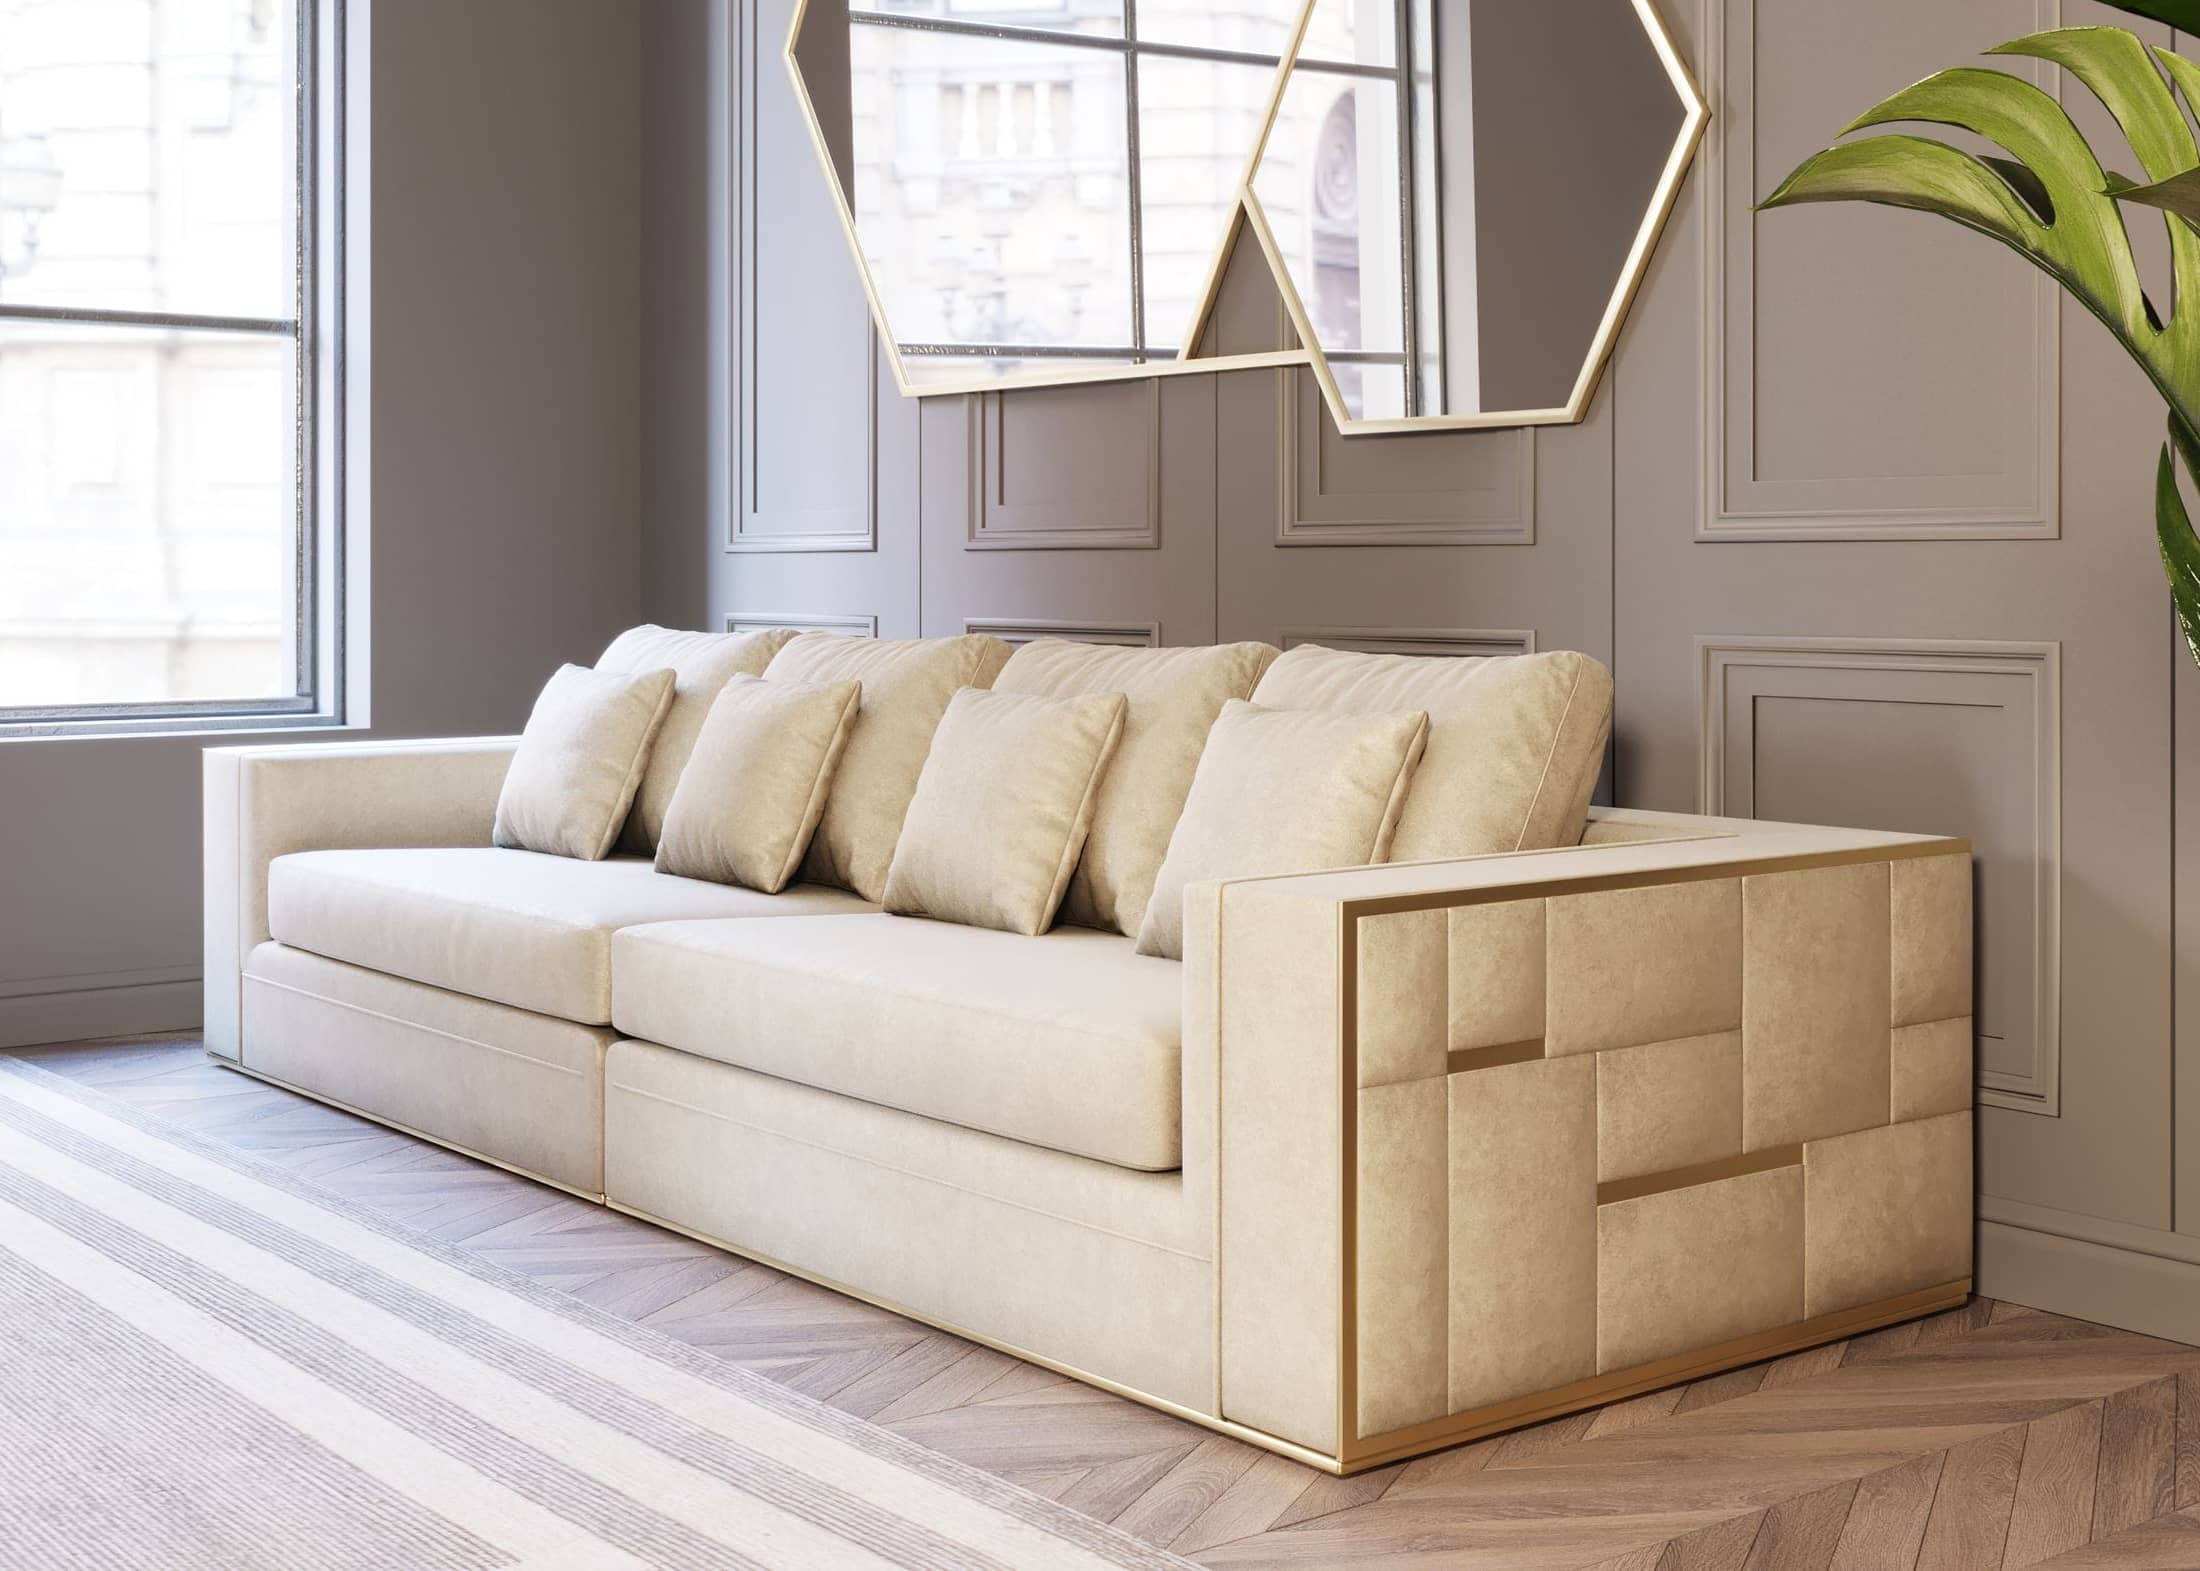 VIG Furniture Divani Casa Mobray Glam Beige and Gold Fabric Sofa